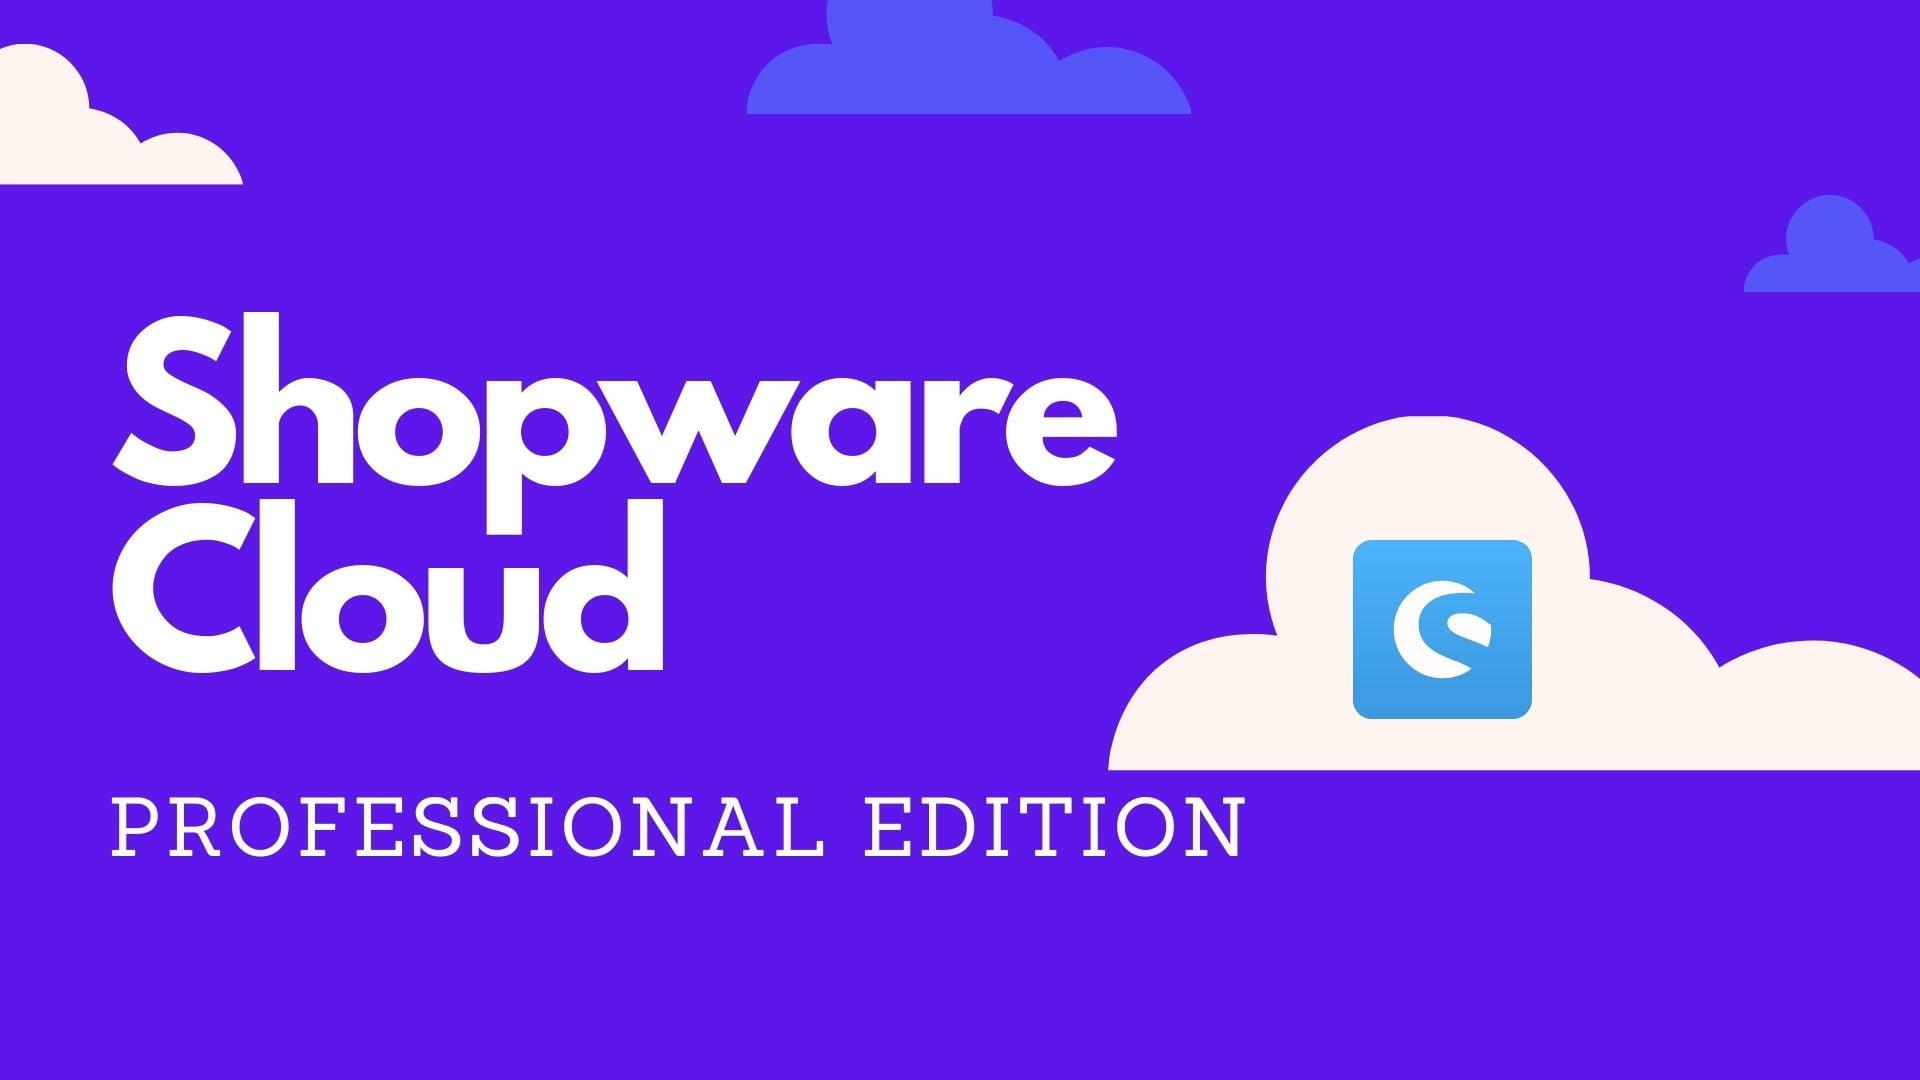 Shopware cloud professional edition